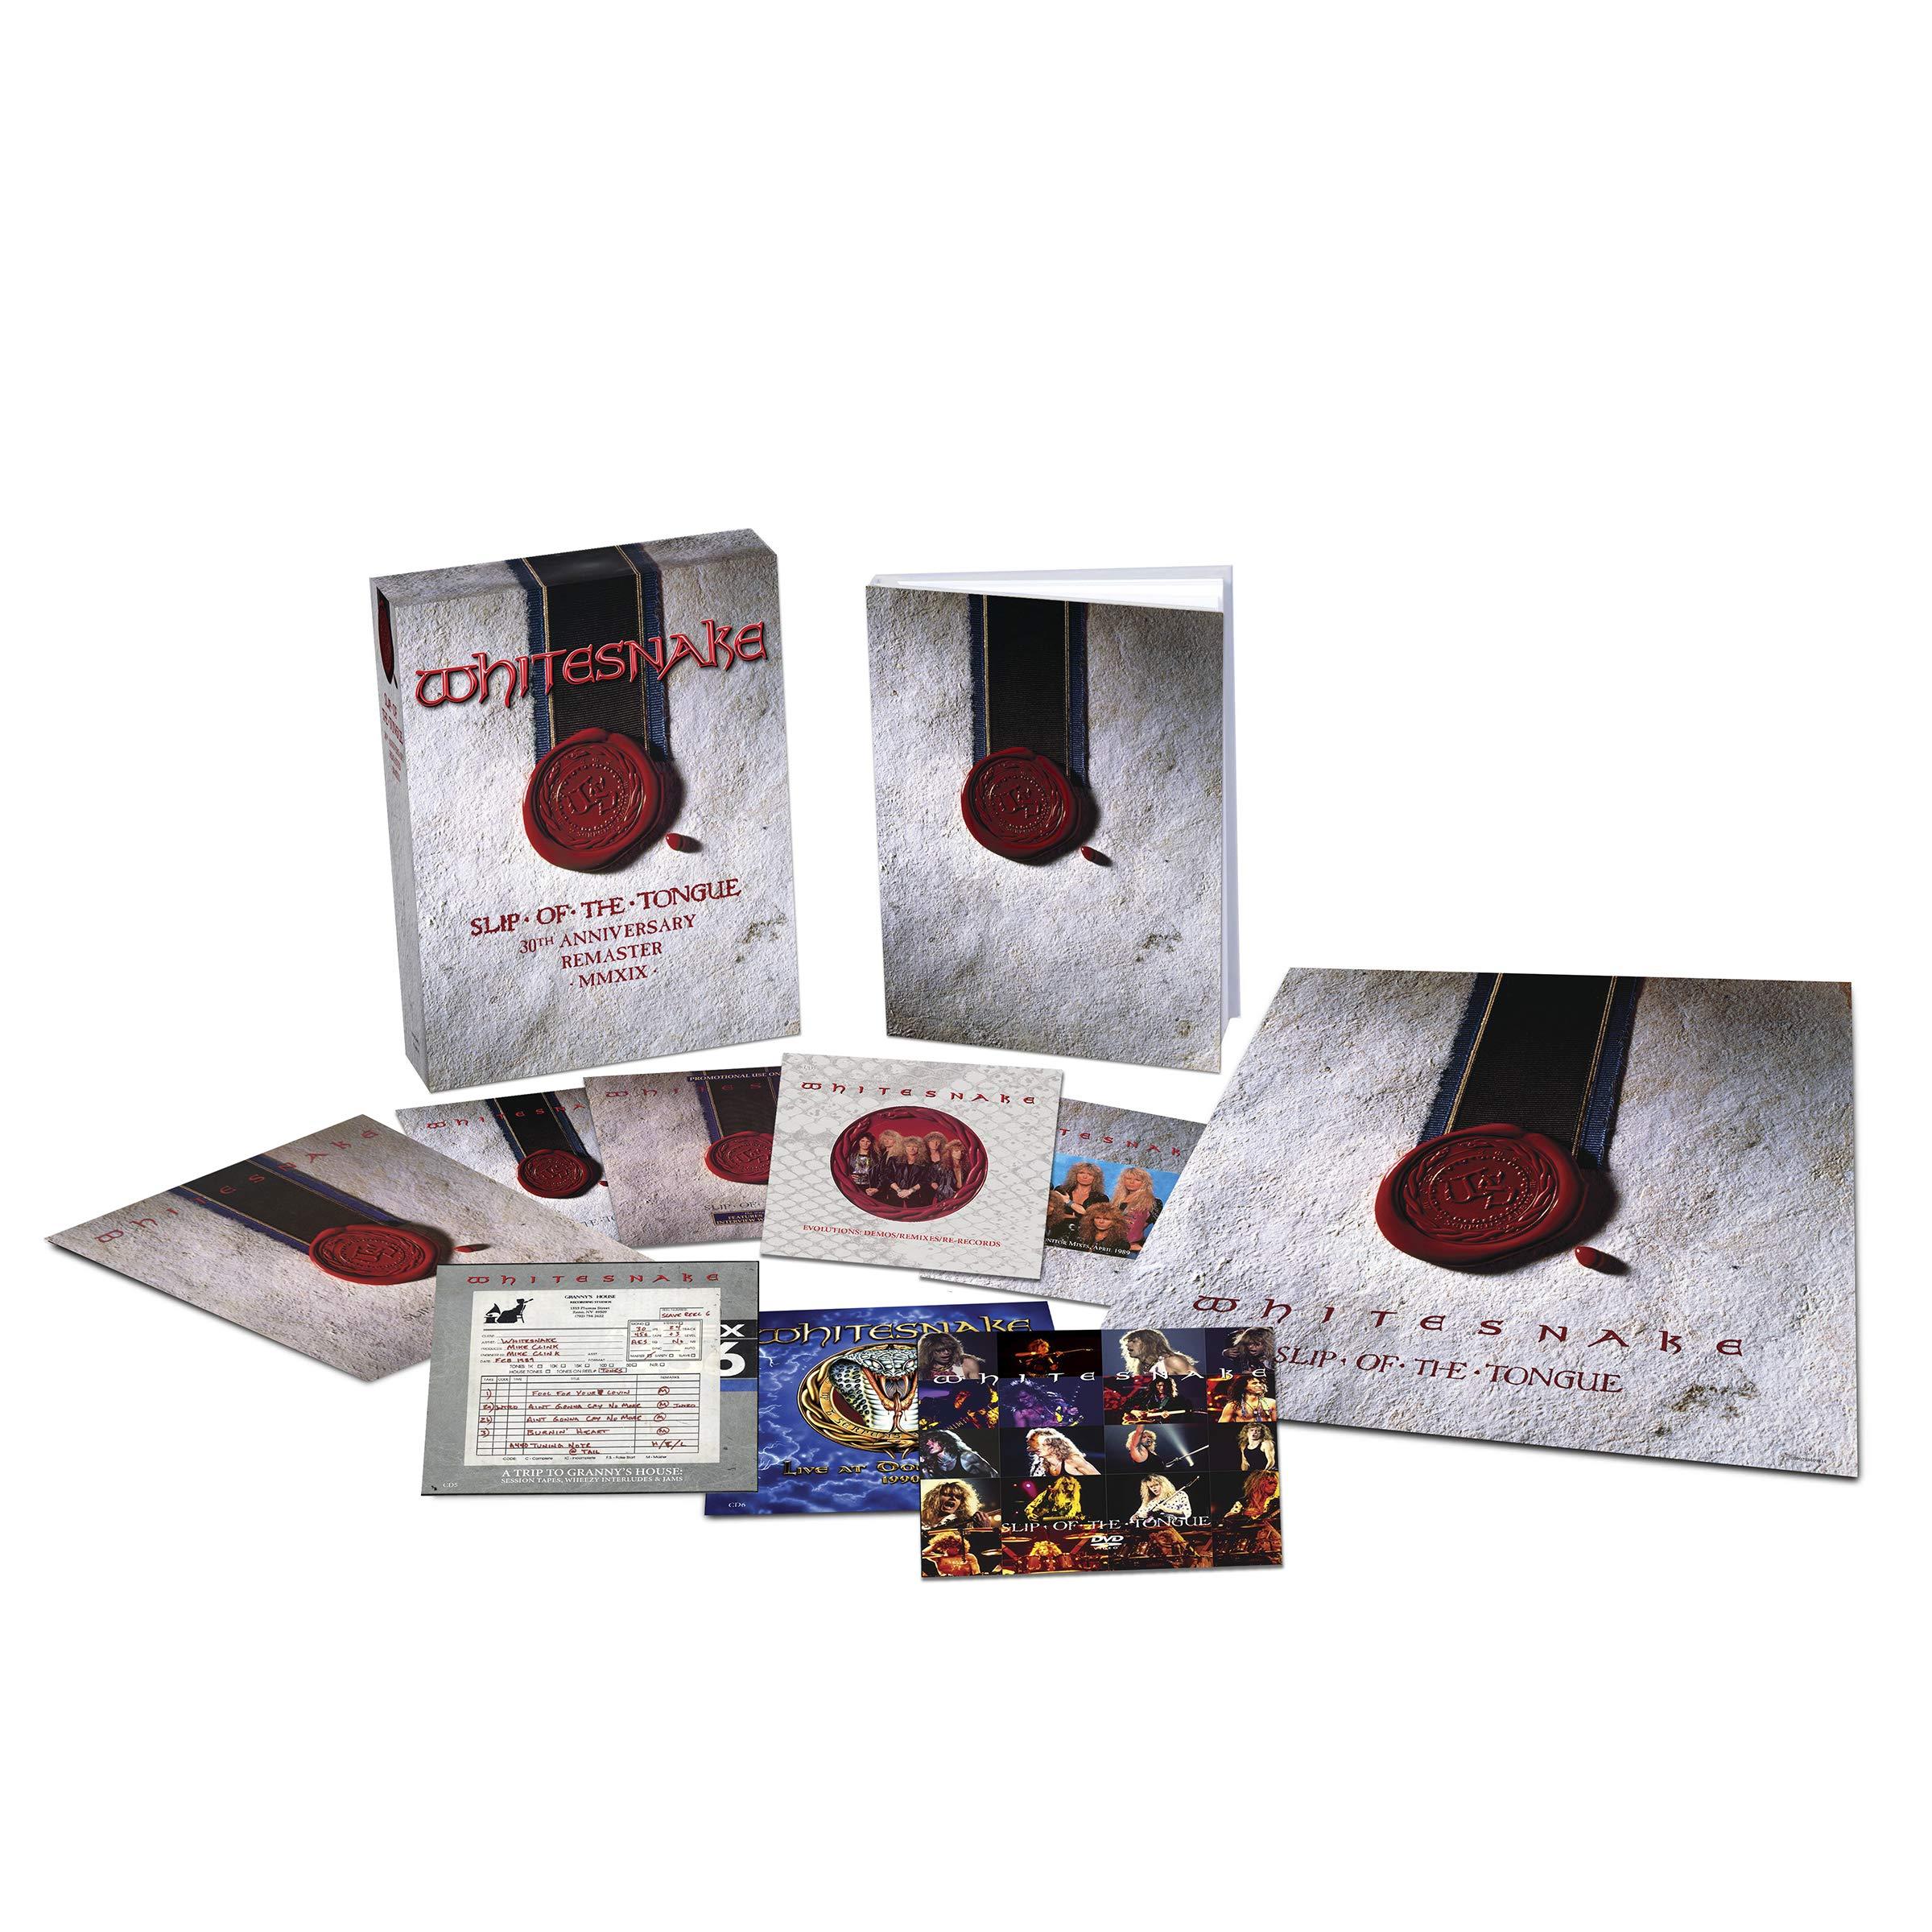 Whitesnake – Slip Of The Tongue  30th Anniversary Remaster MMXIX (2019) [FLAC]